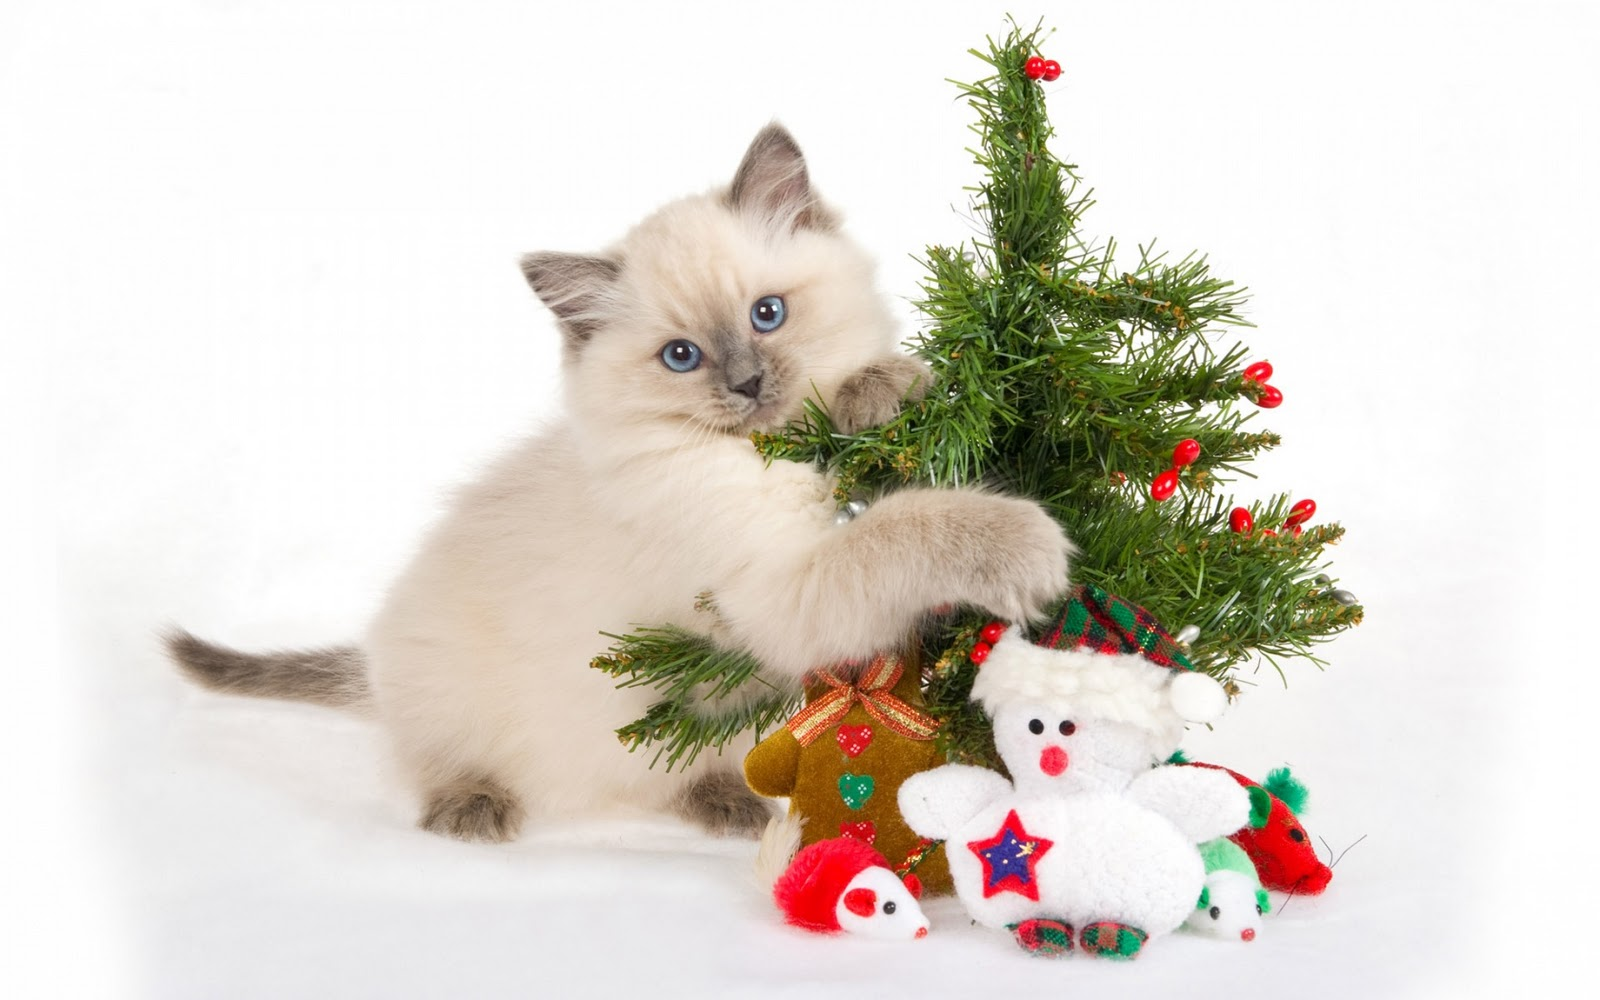 Christmas Tree Wallpaper